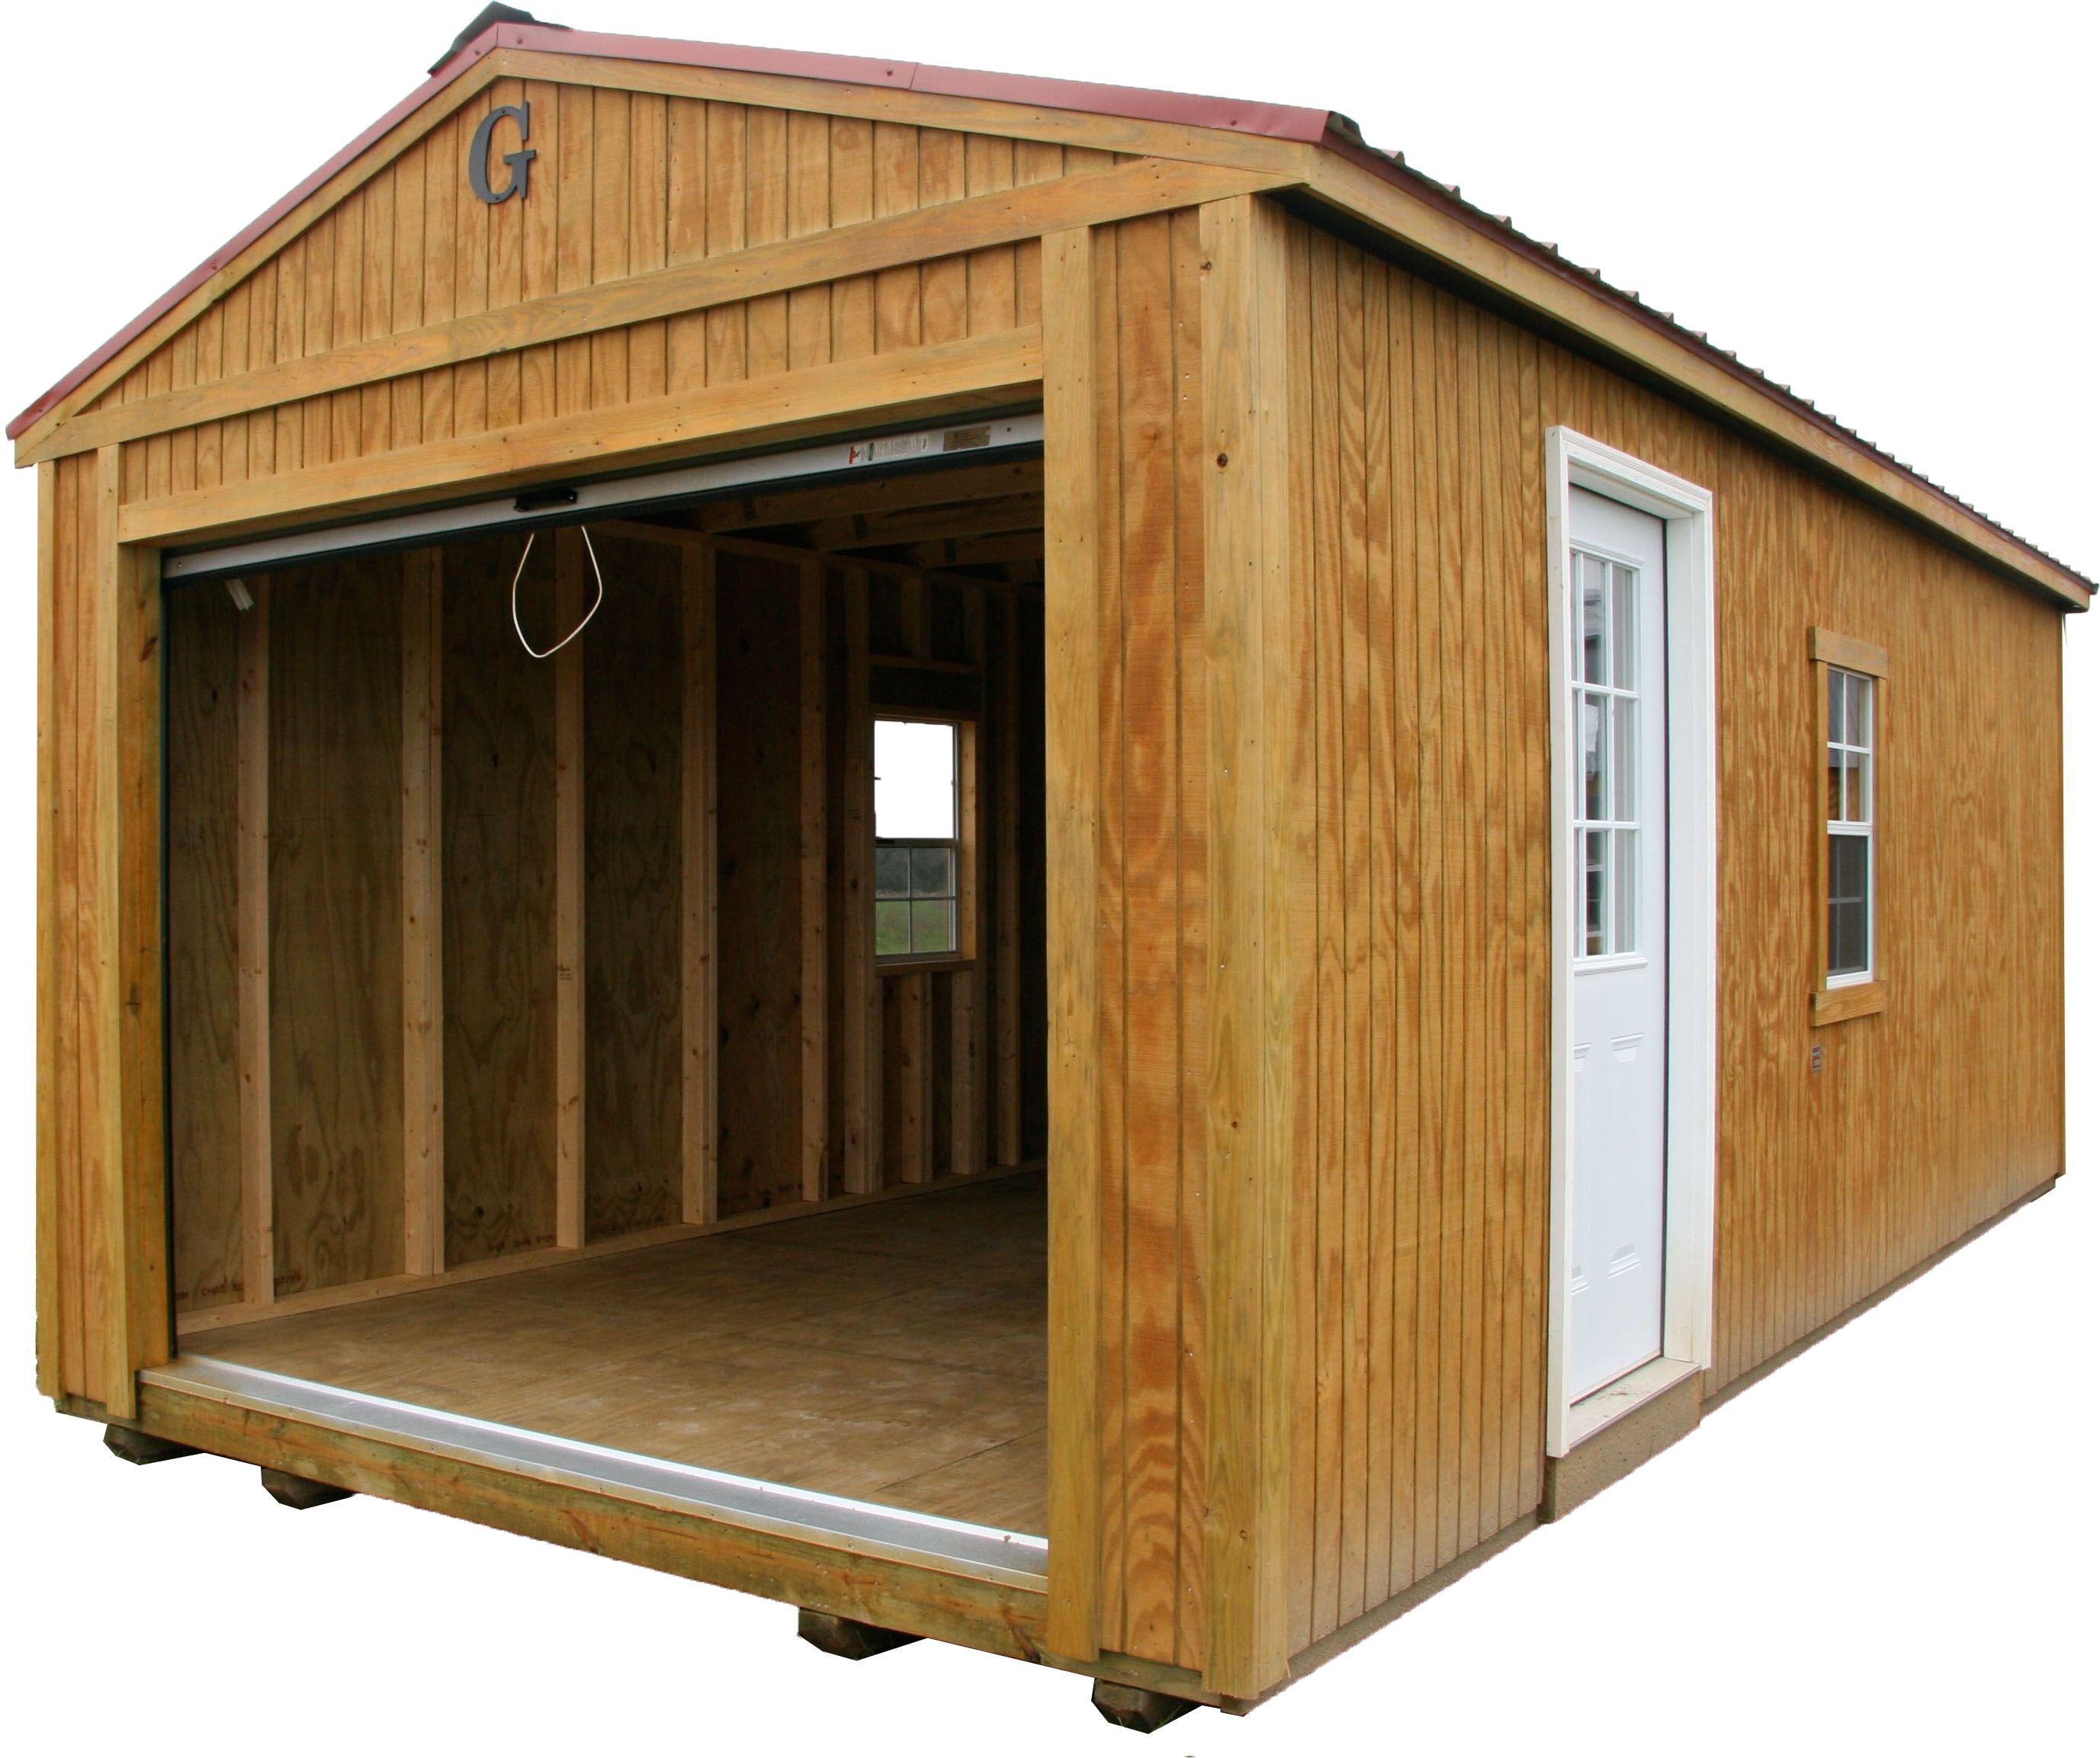 Large Portable Buildings : Open garage portable building by big b buildings